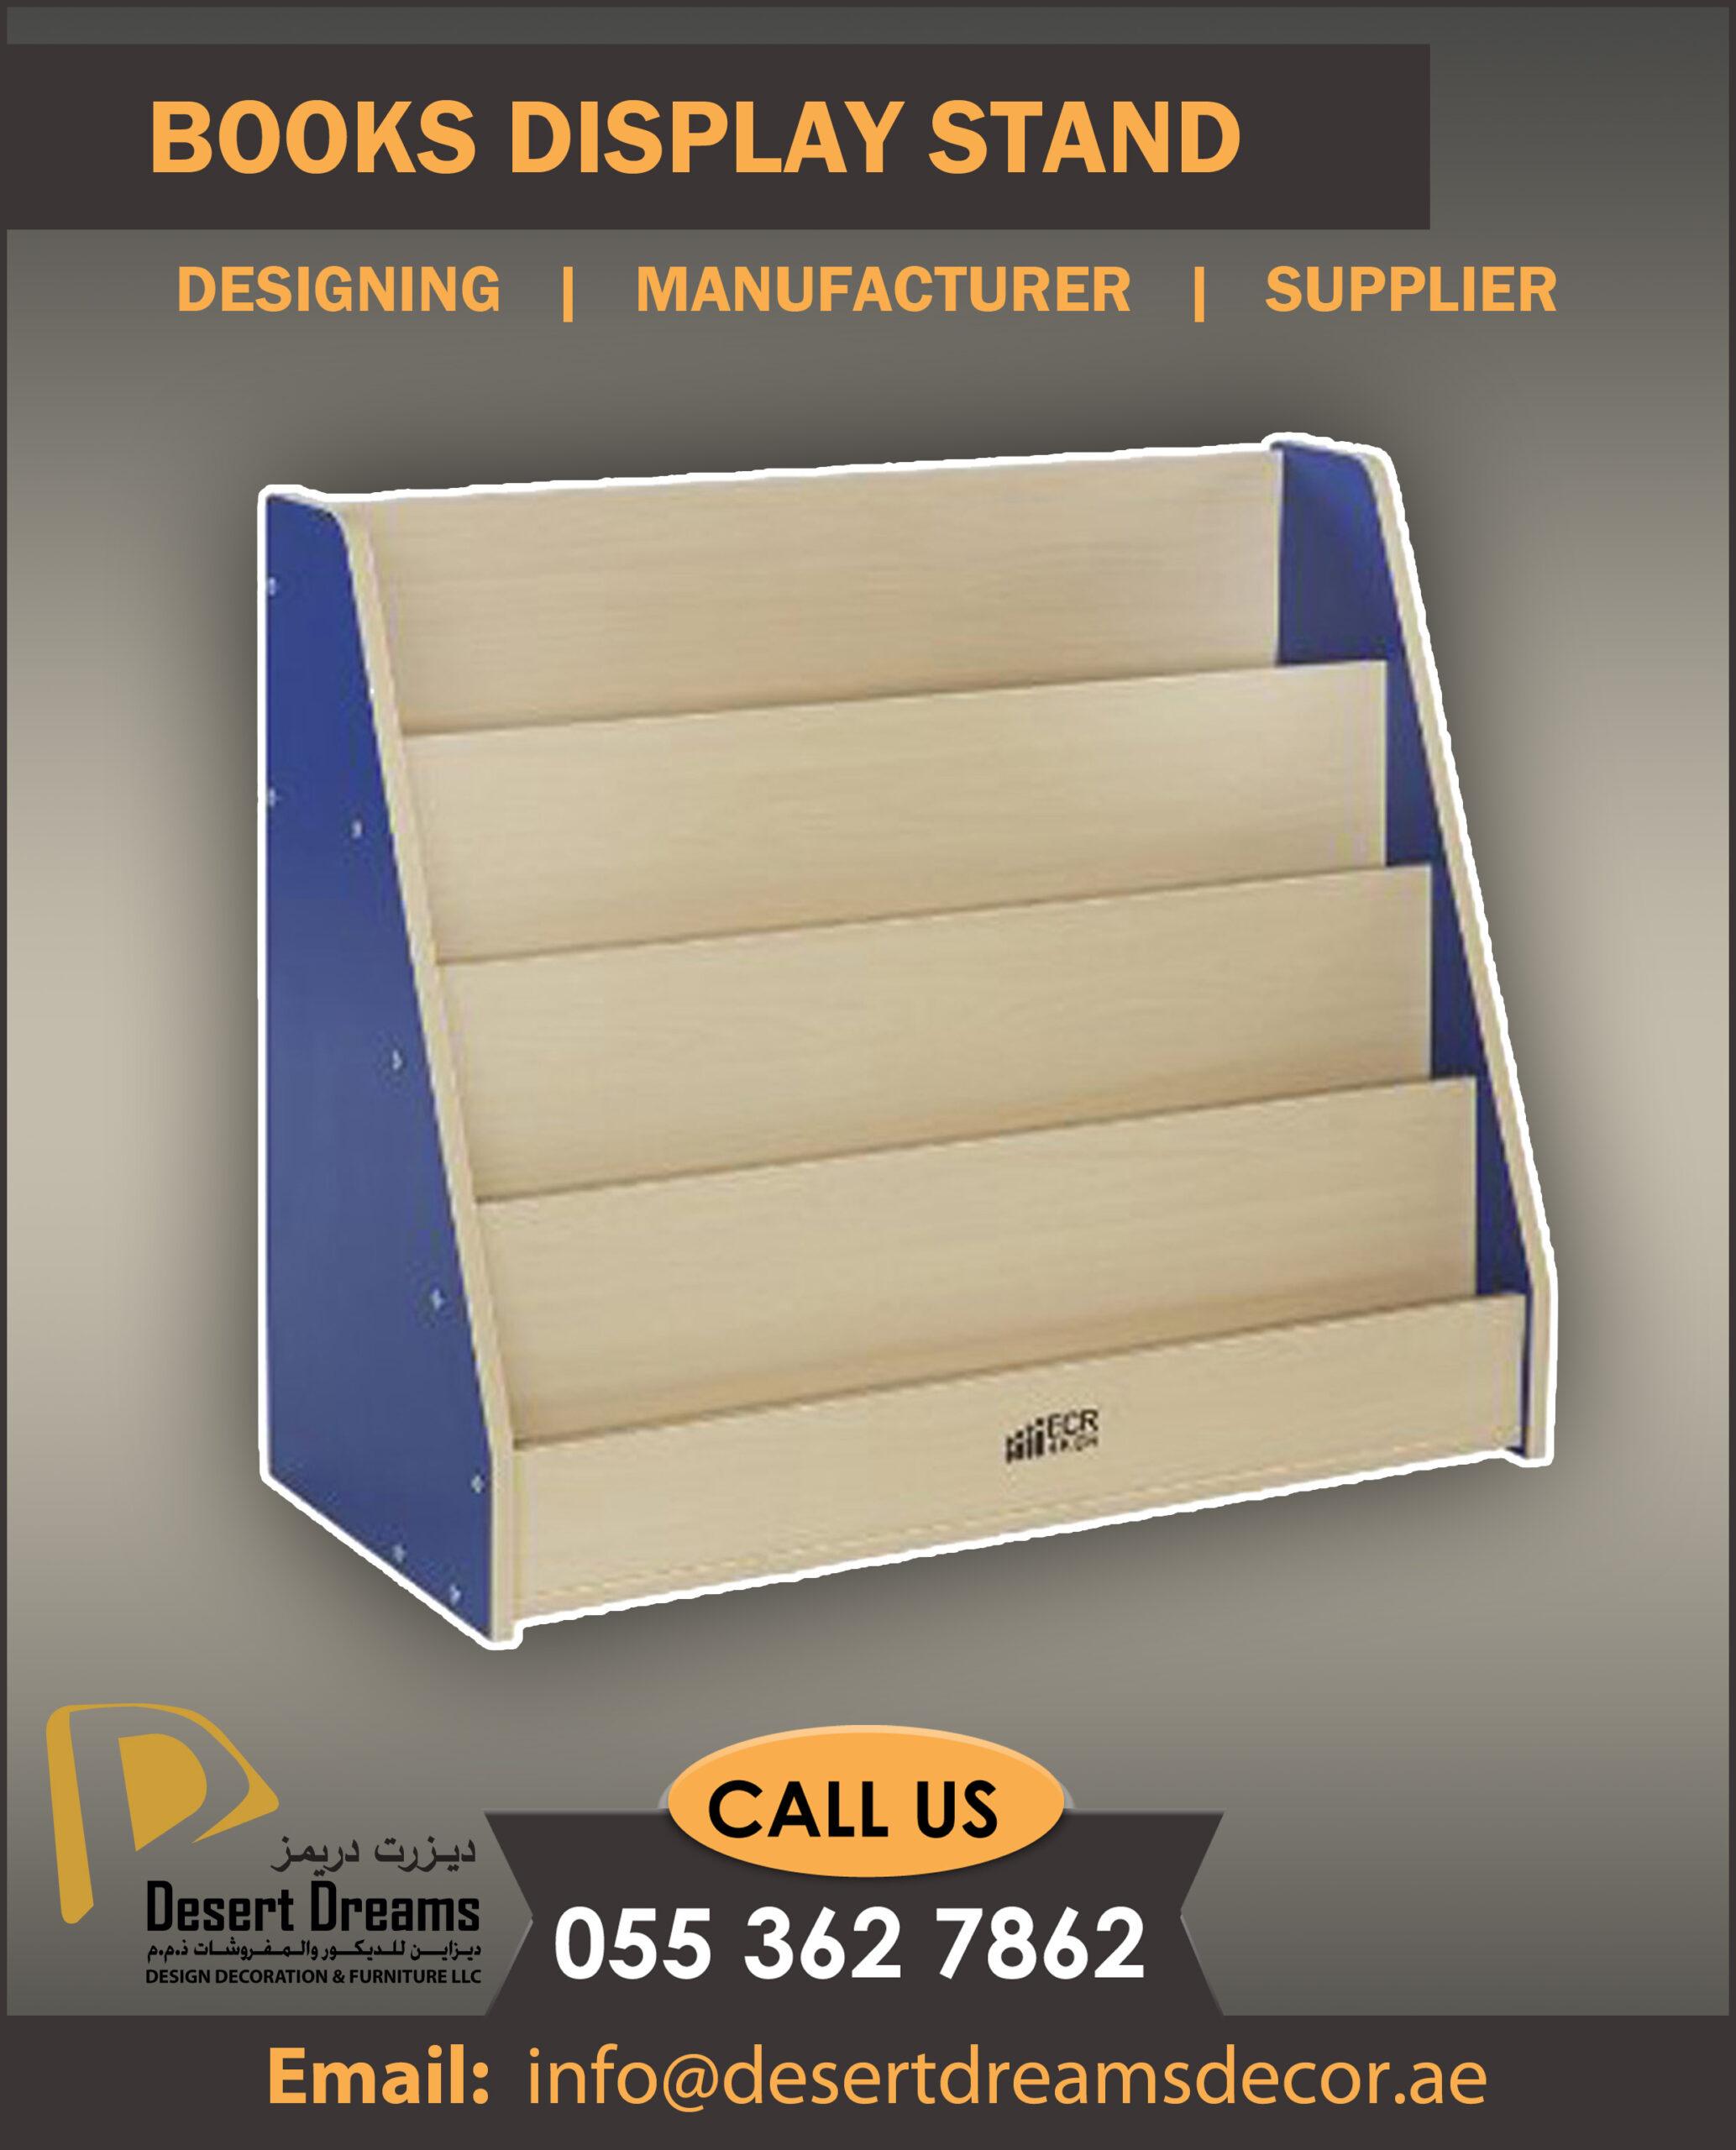 0553627862-Books Display Stands in UAE-5 (1).jpg